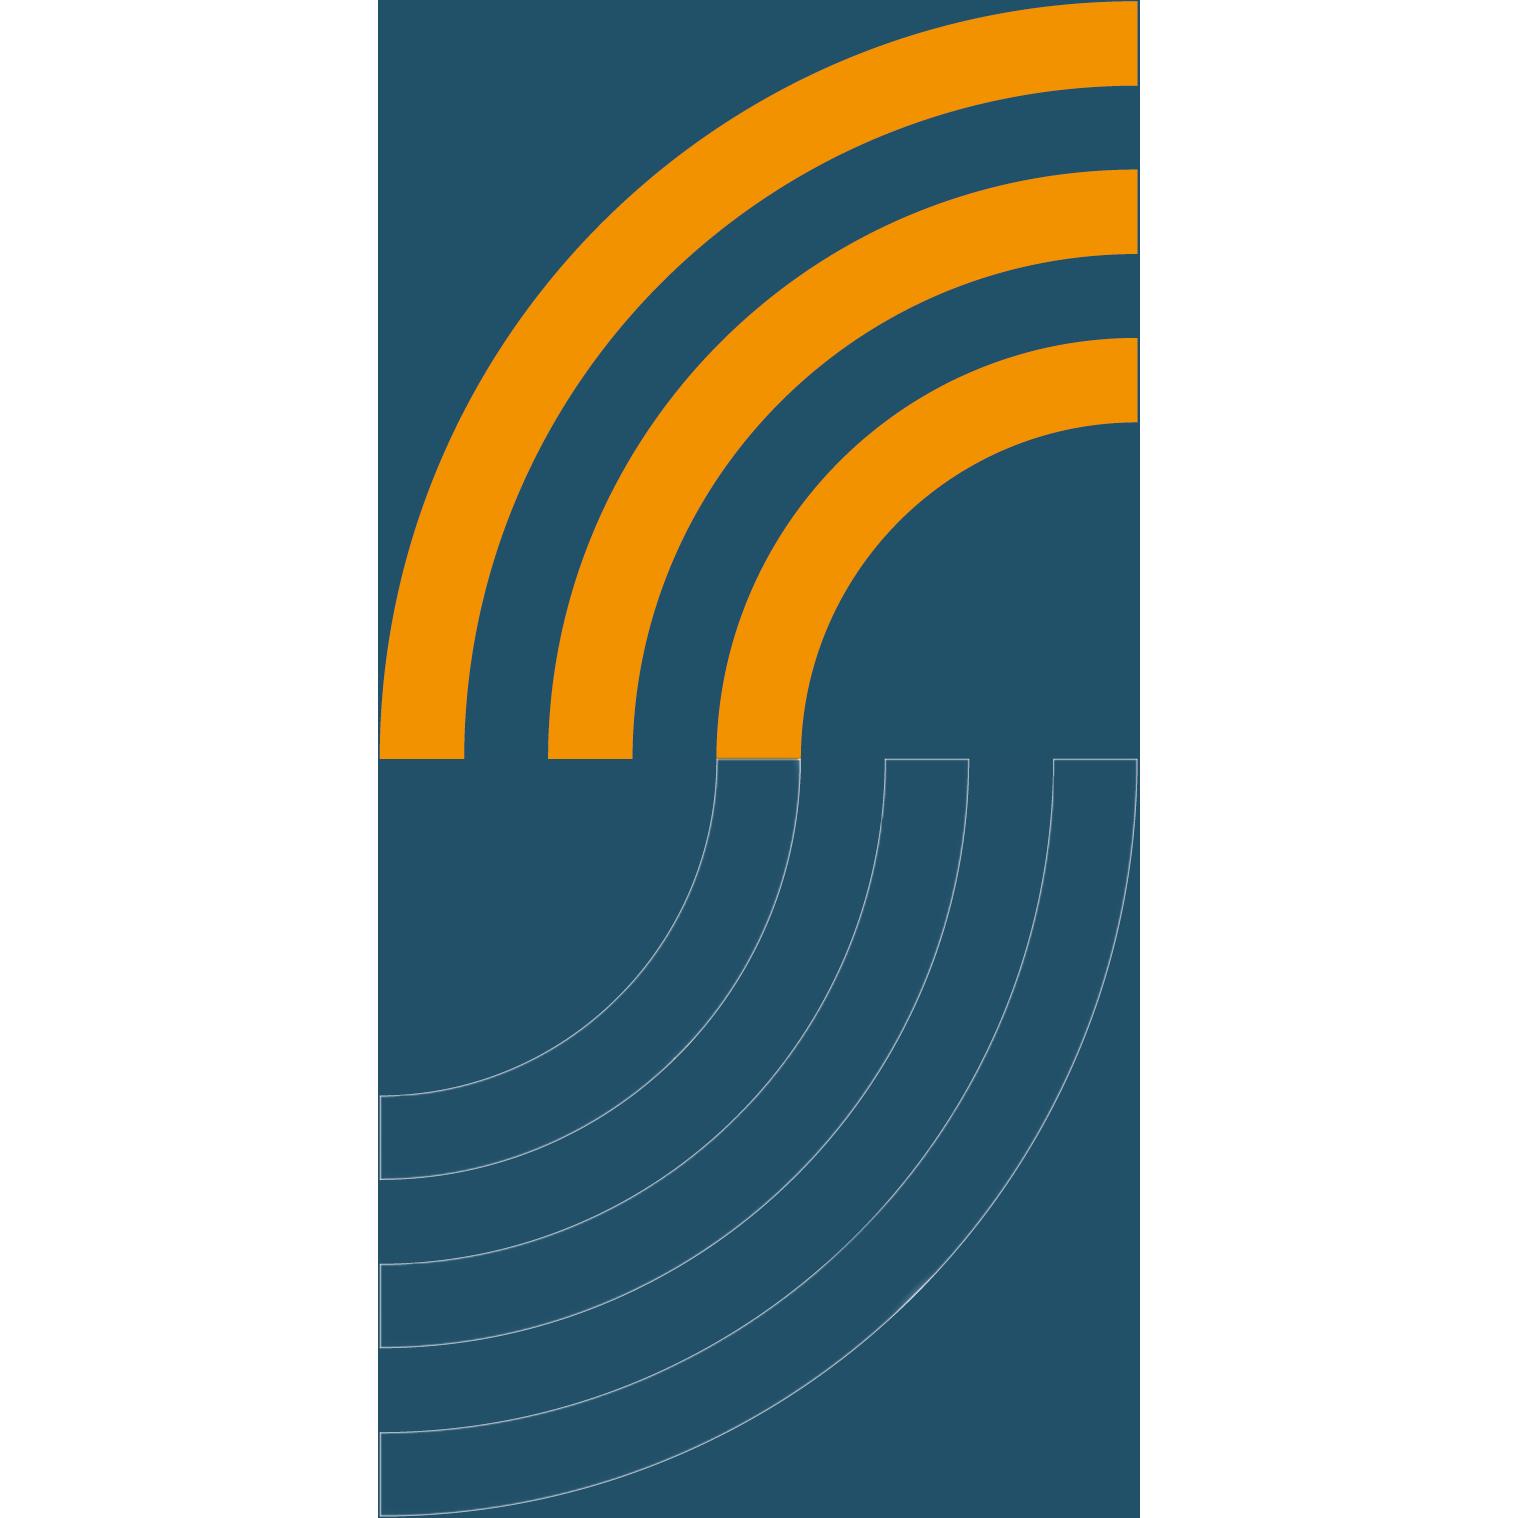 www.soundimports.eu